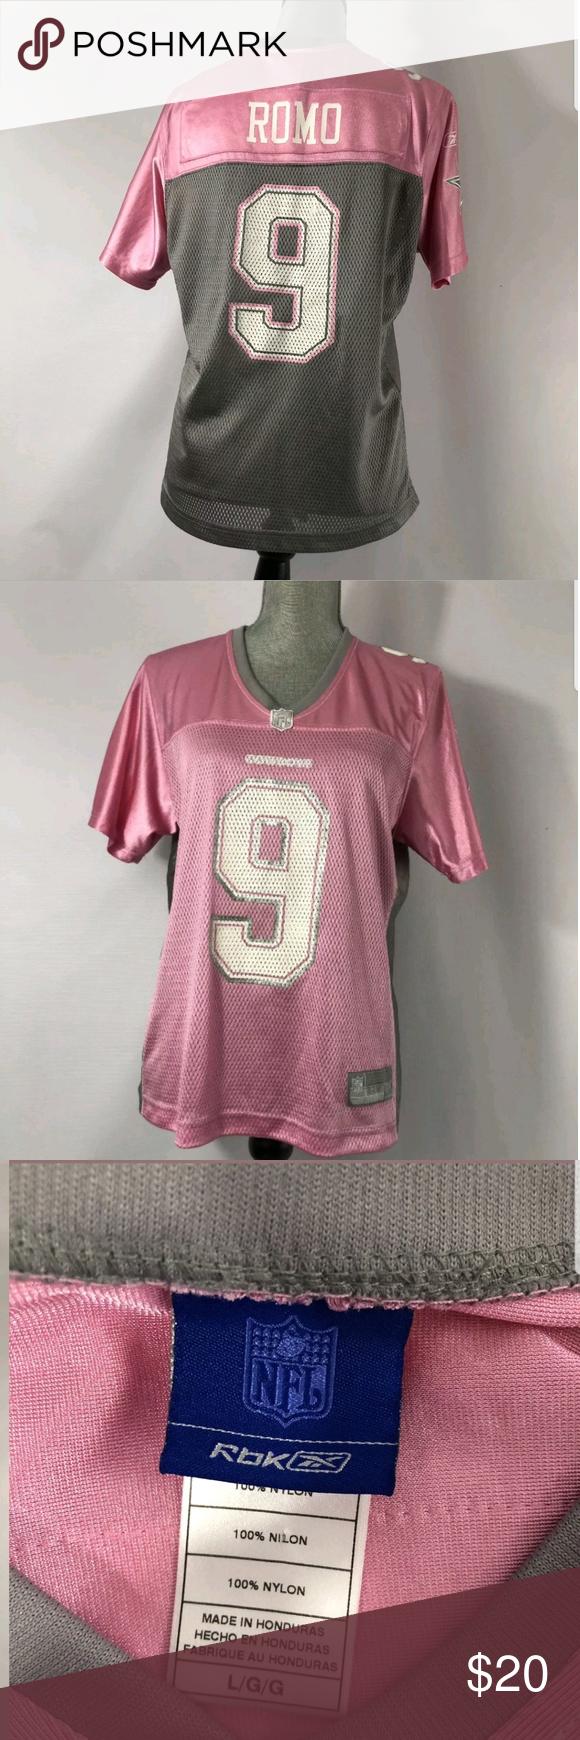 44eae64ce82 Dallas Cowboys Jersey Reebok Tony Romo Womens Girl Dallas Cowboys Jersey  Reebok Tony Romo Womens Girls